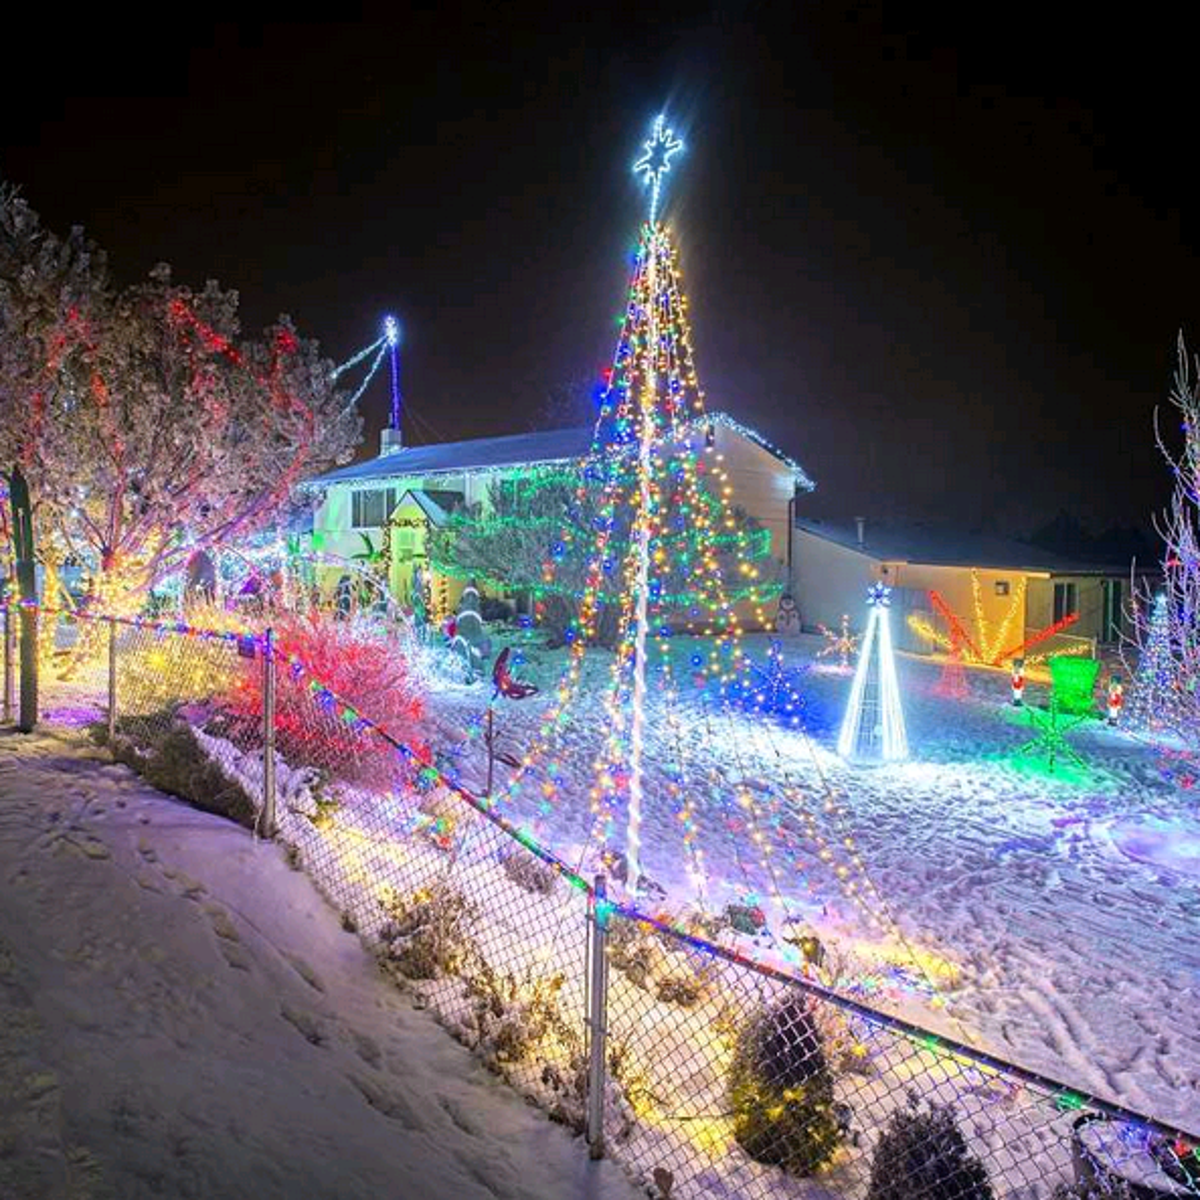 Local Christmas light displays worth